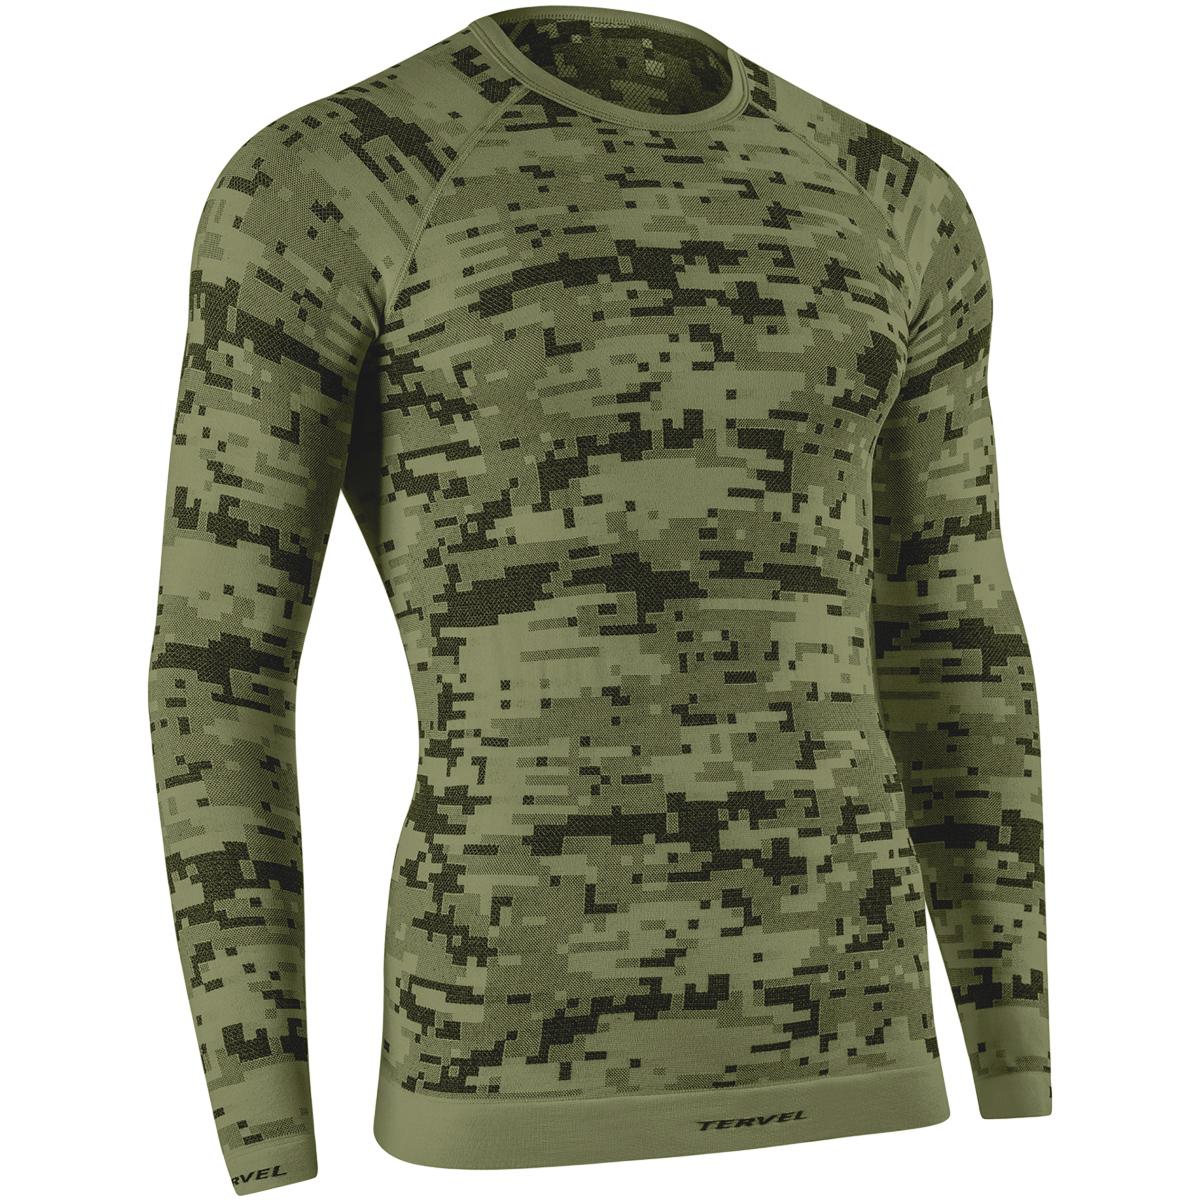 Tervel Optiline Digital Top Mens Long Sleeve Underwear Shirt ...